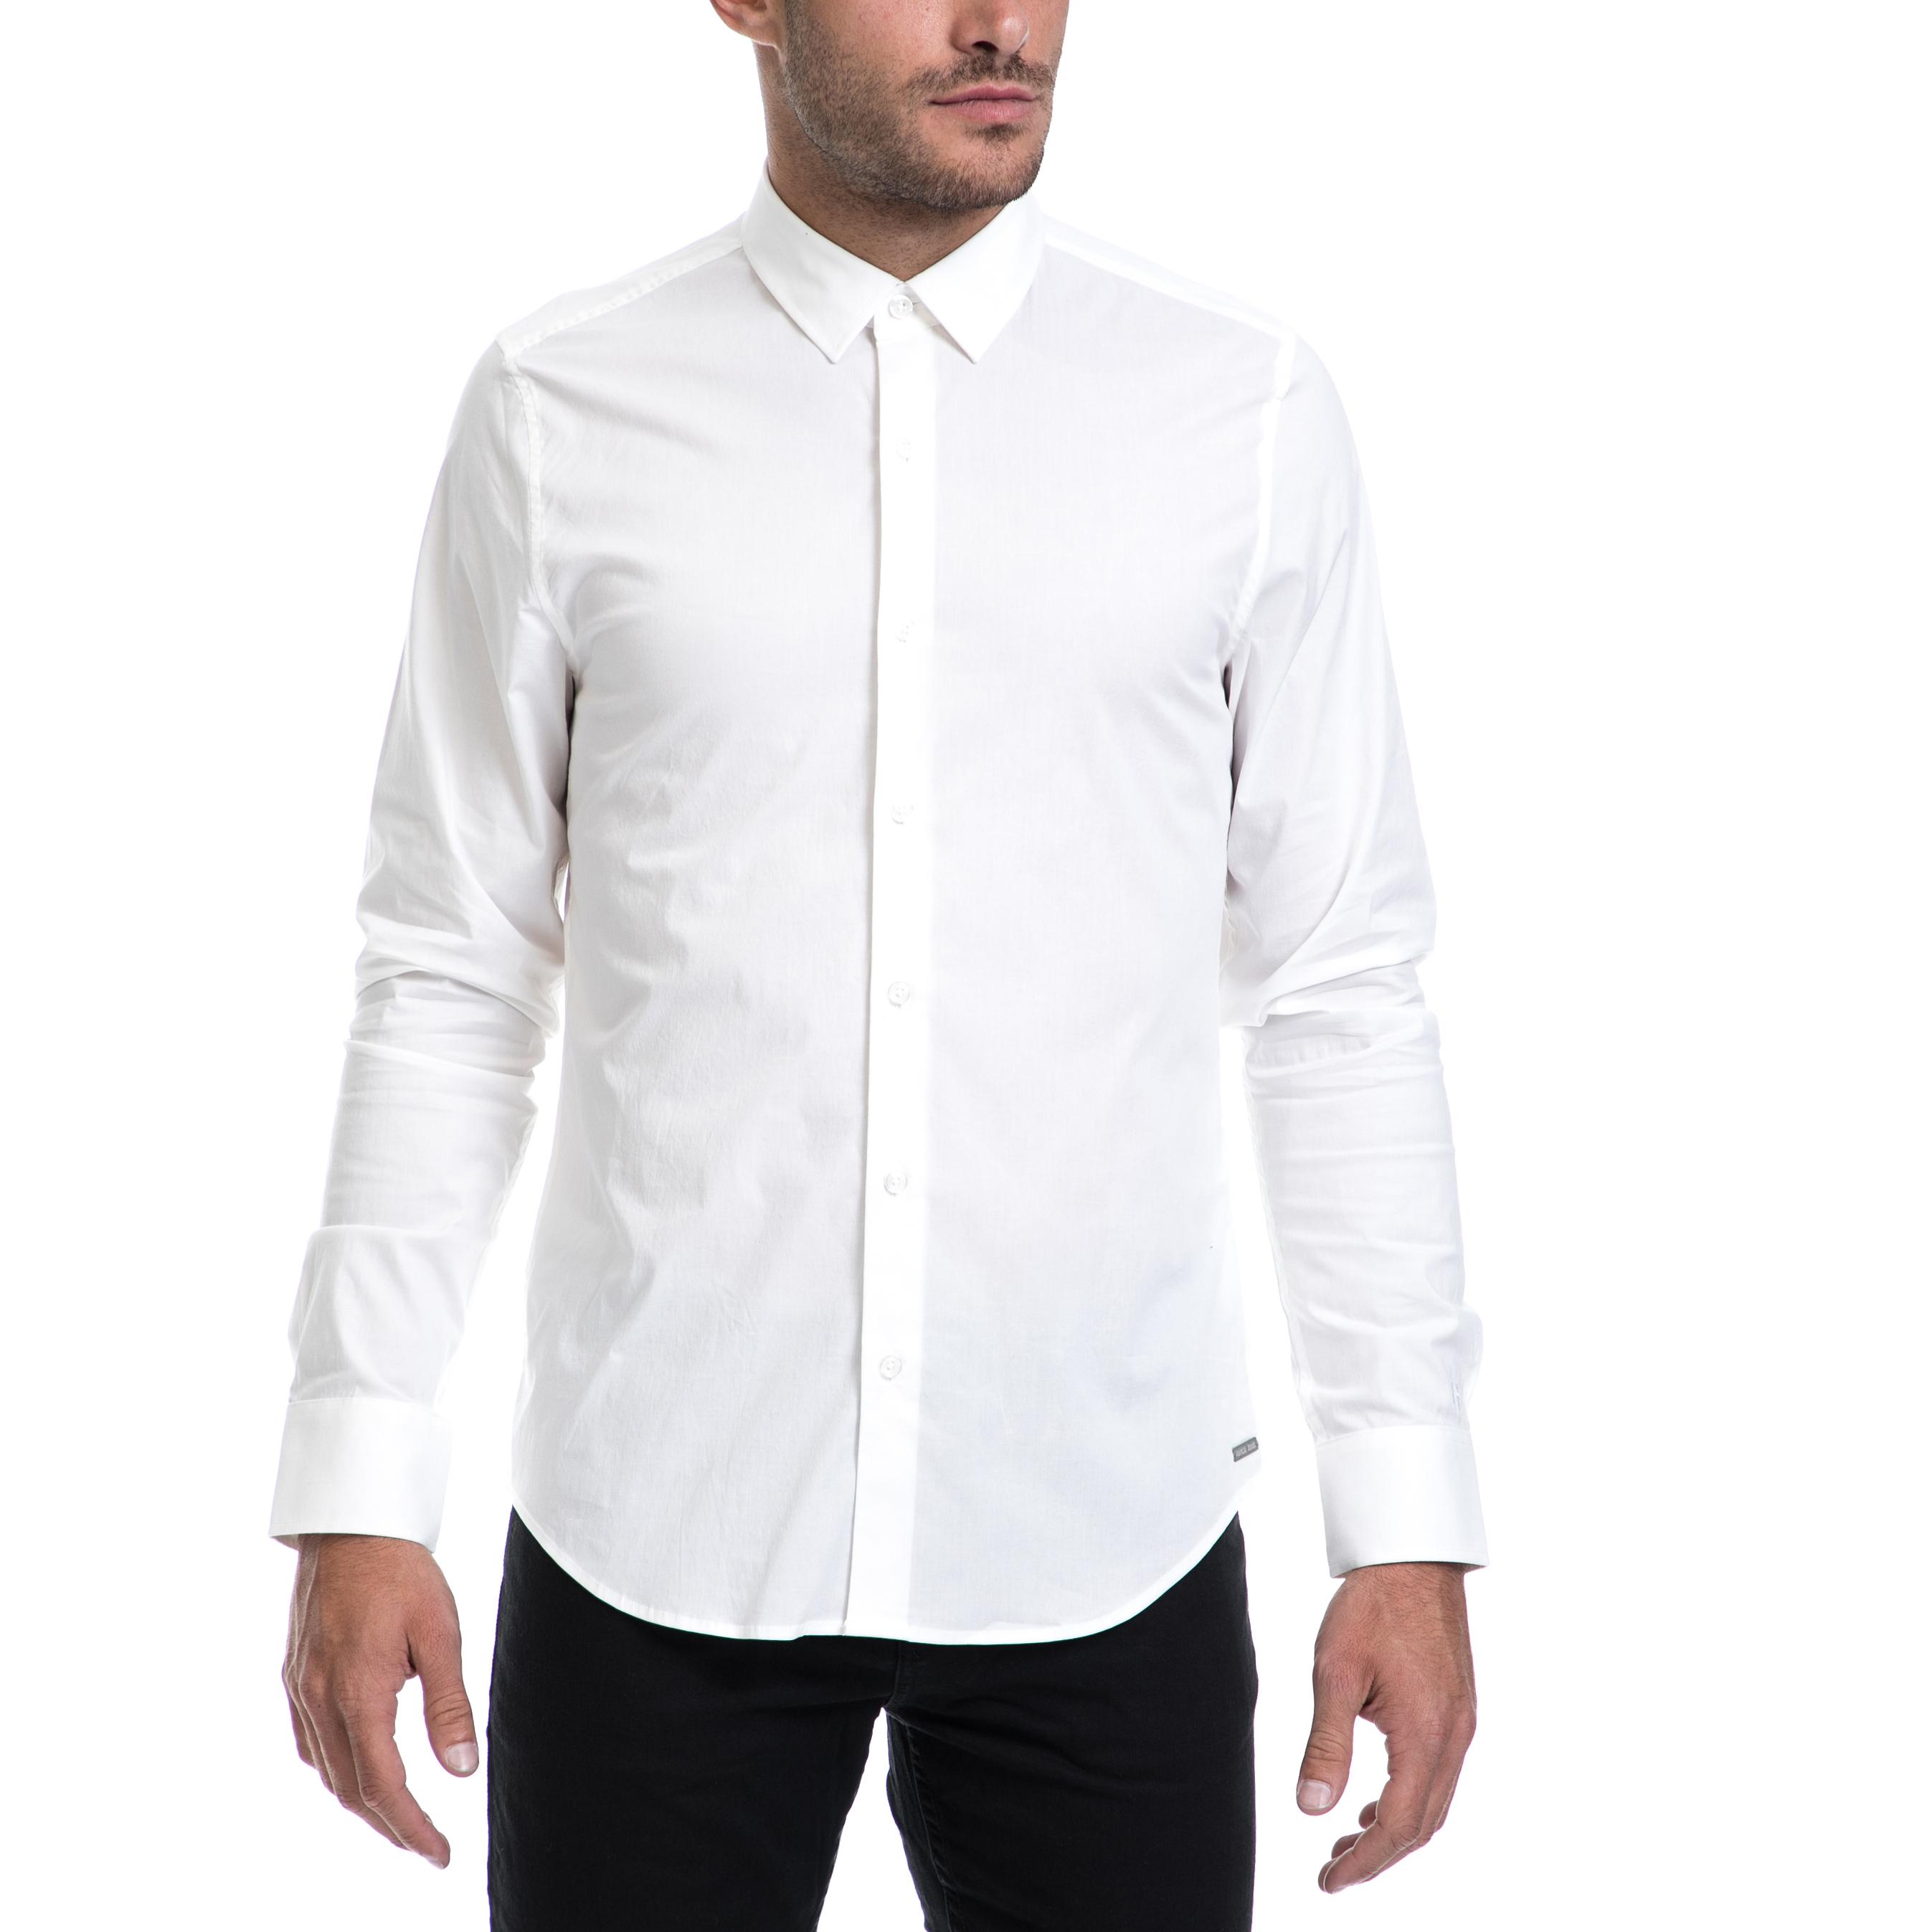 GARCIA JEANS - Αντρικό πουλάμισο Dario GARCIA JEANS άσπρο ανδρικά ρούχα πουκάμισα μακρυμάνικα